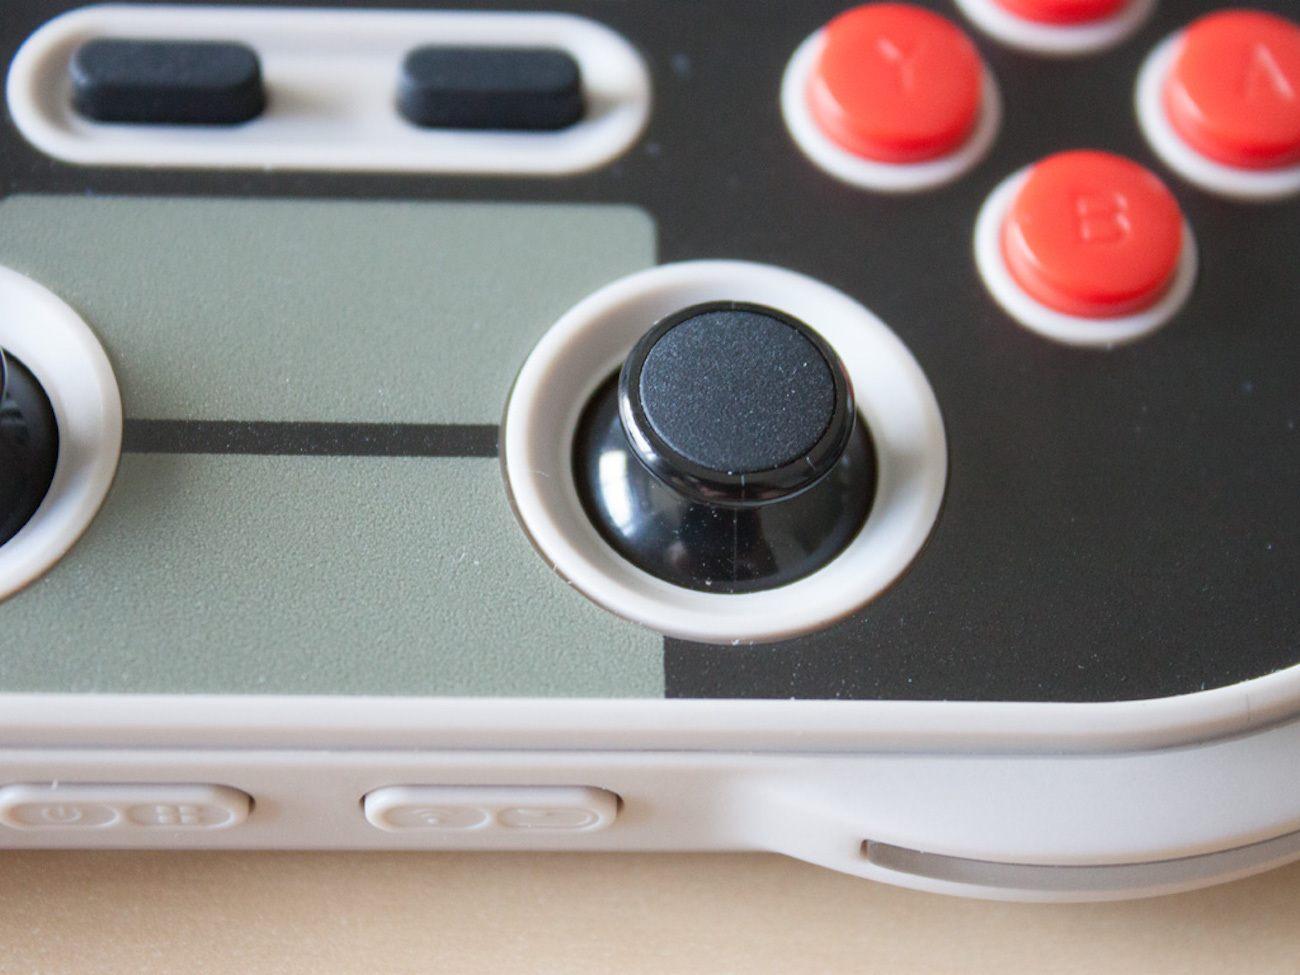 Crissaegrim NES30 PRO Controller by 8Bitdo